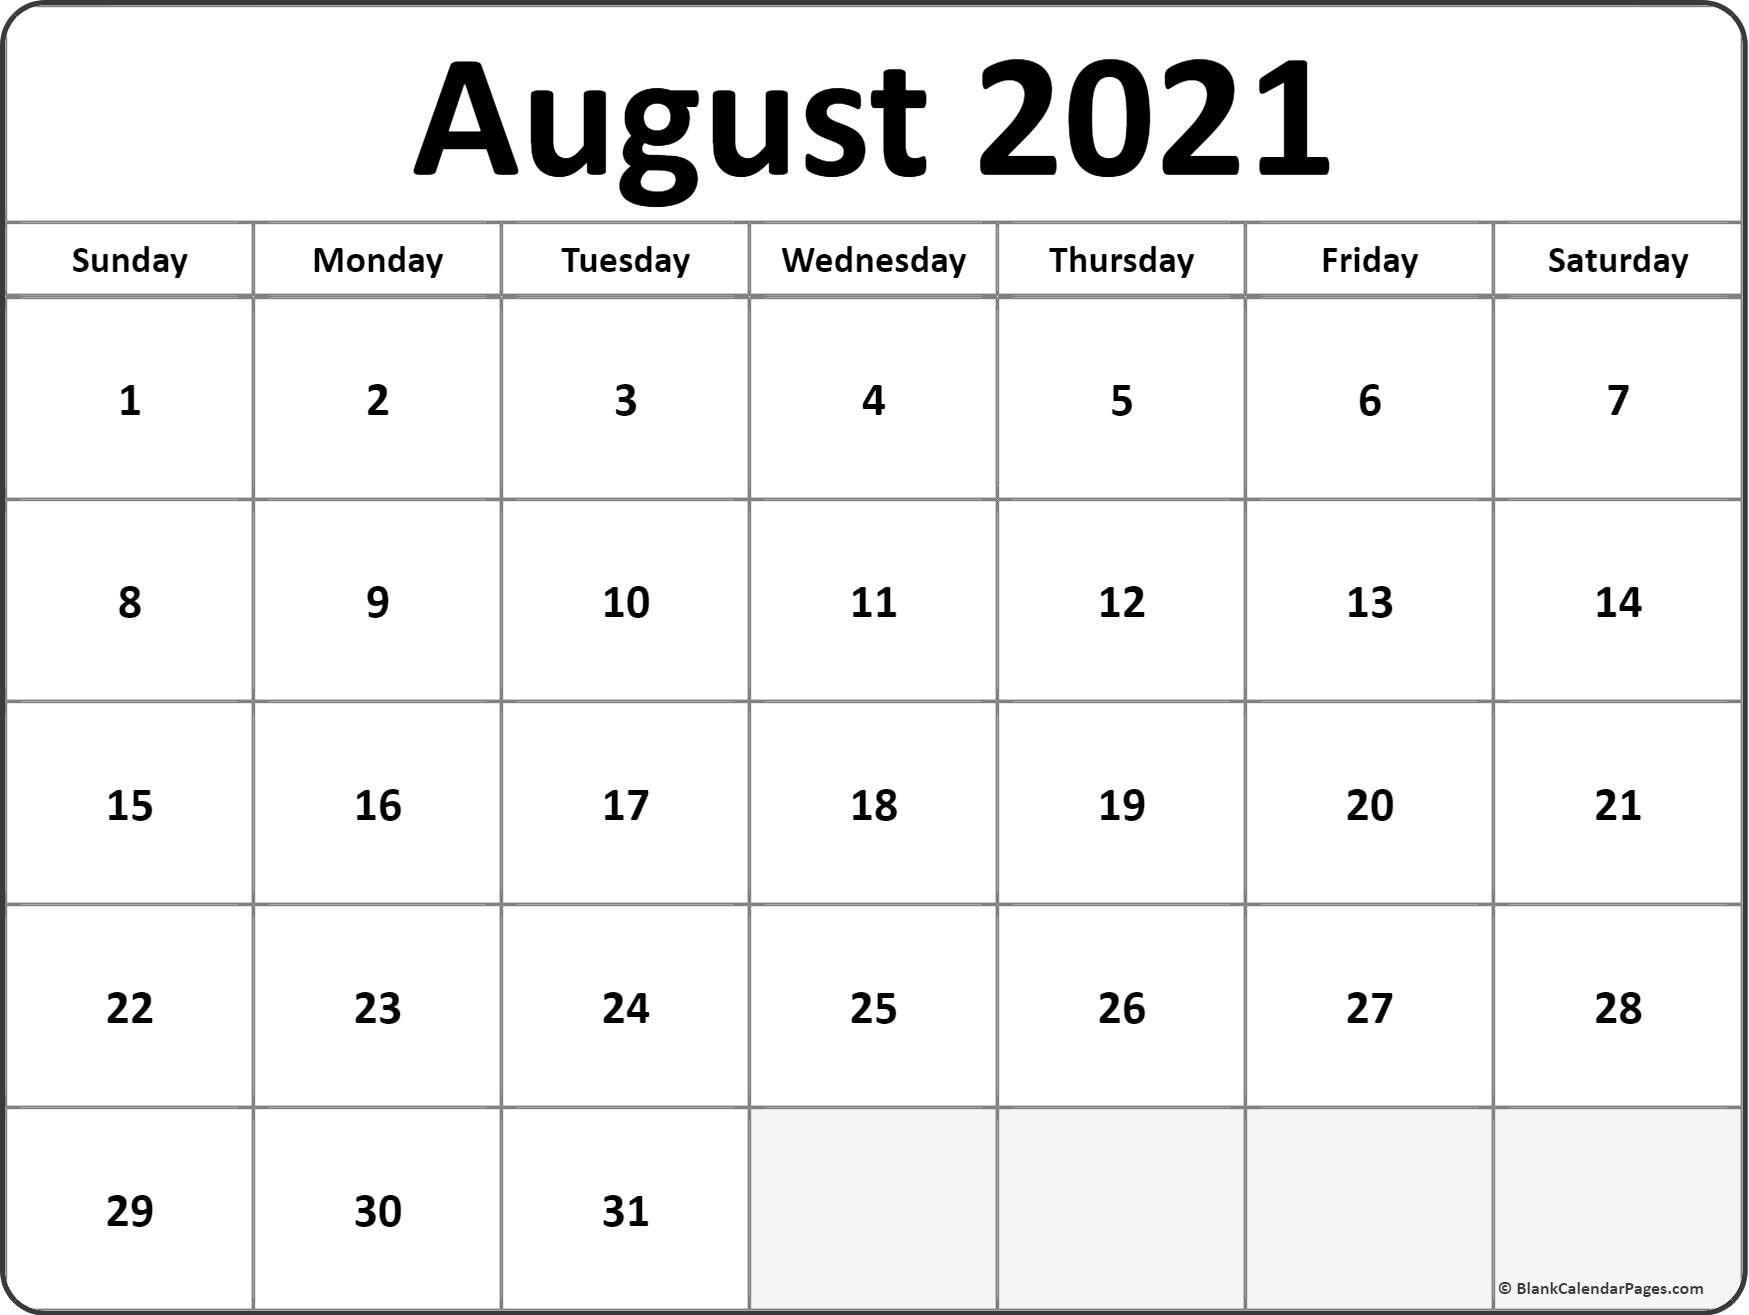 Calendar Monthly 2021 Printable August Full Page August 2021 Calendar Print